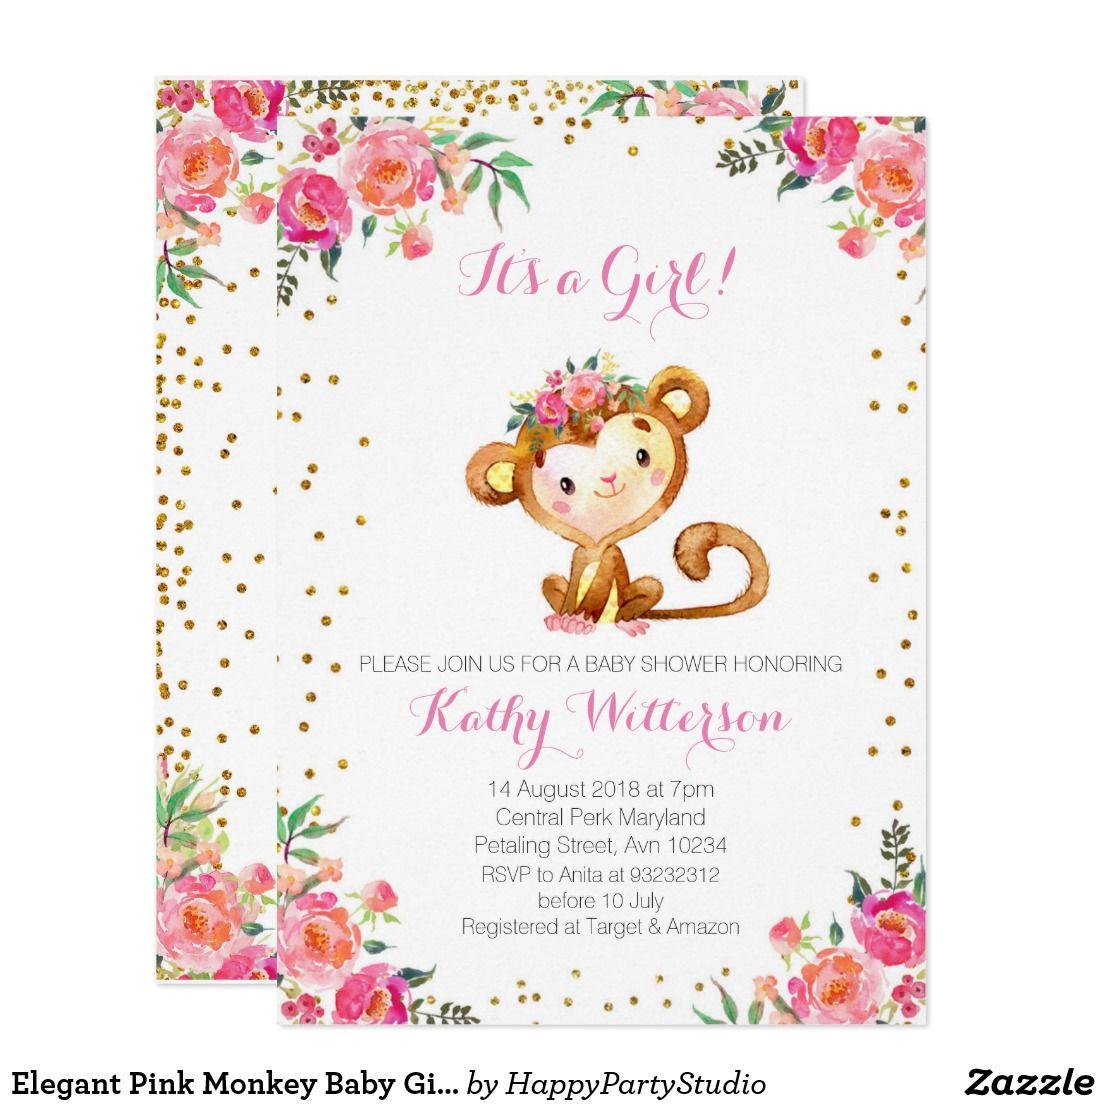 Elegant pink monkey baby girl shower invitation babies and baby elegant pink monkey baby girl shower invitation cute and sweet elegant pink monkey baby girl shower floral and gold confetti perfect for your baby shower filmwisefo